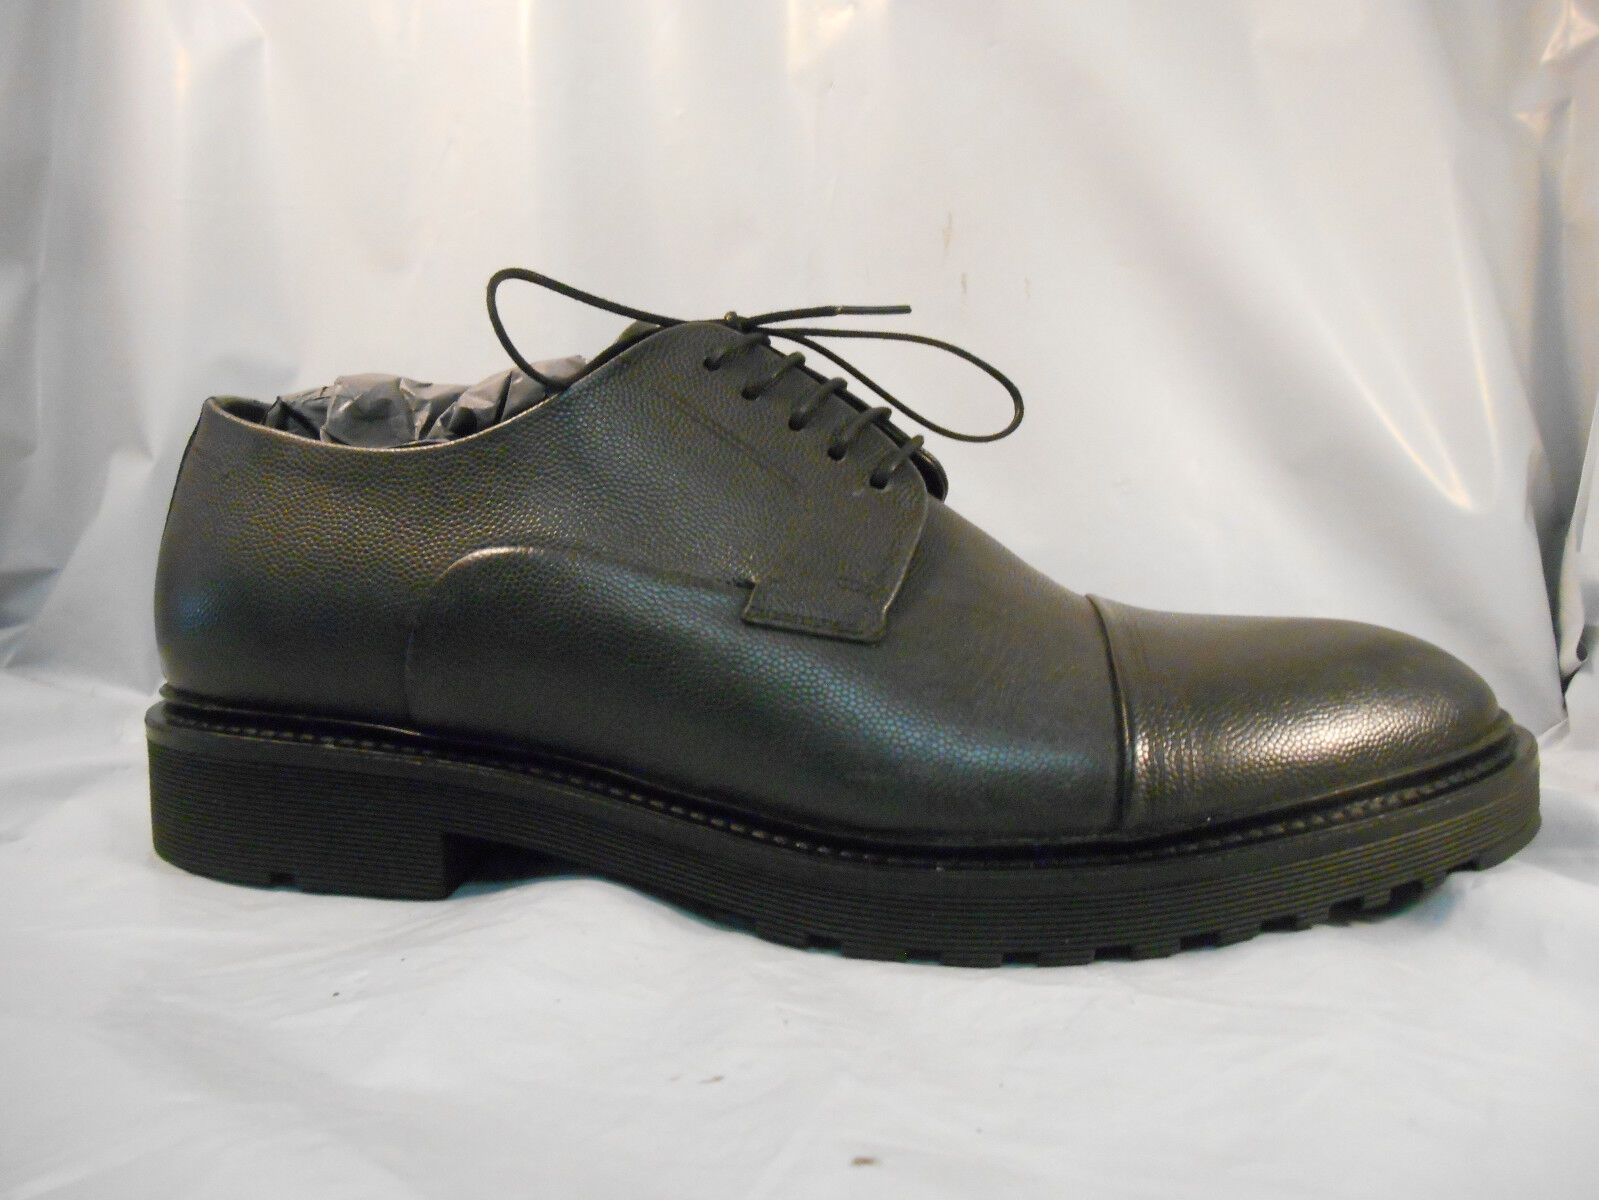 HUGO Boss Pure Derby Textured Black Leather Cap Toe Oxfords Men's 9 M   42 EU